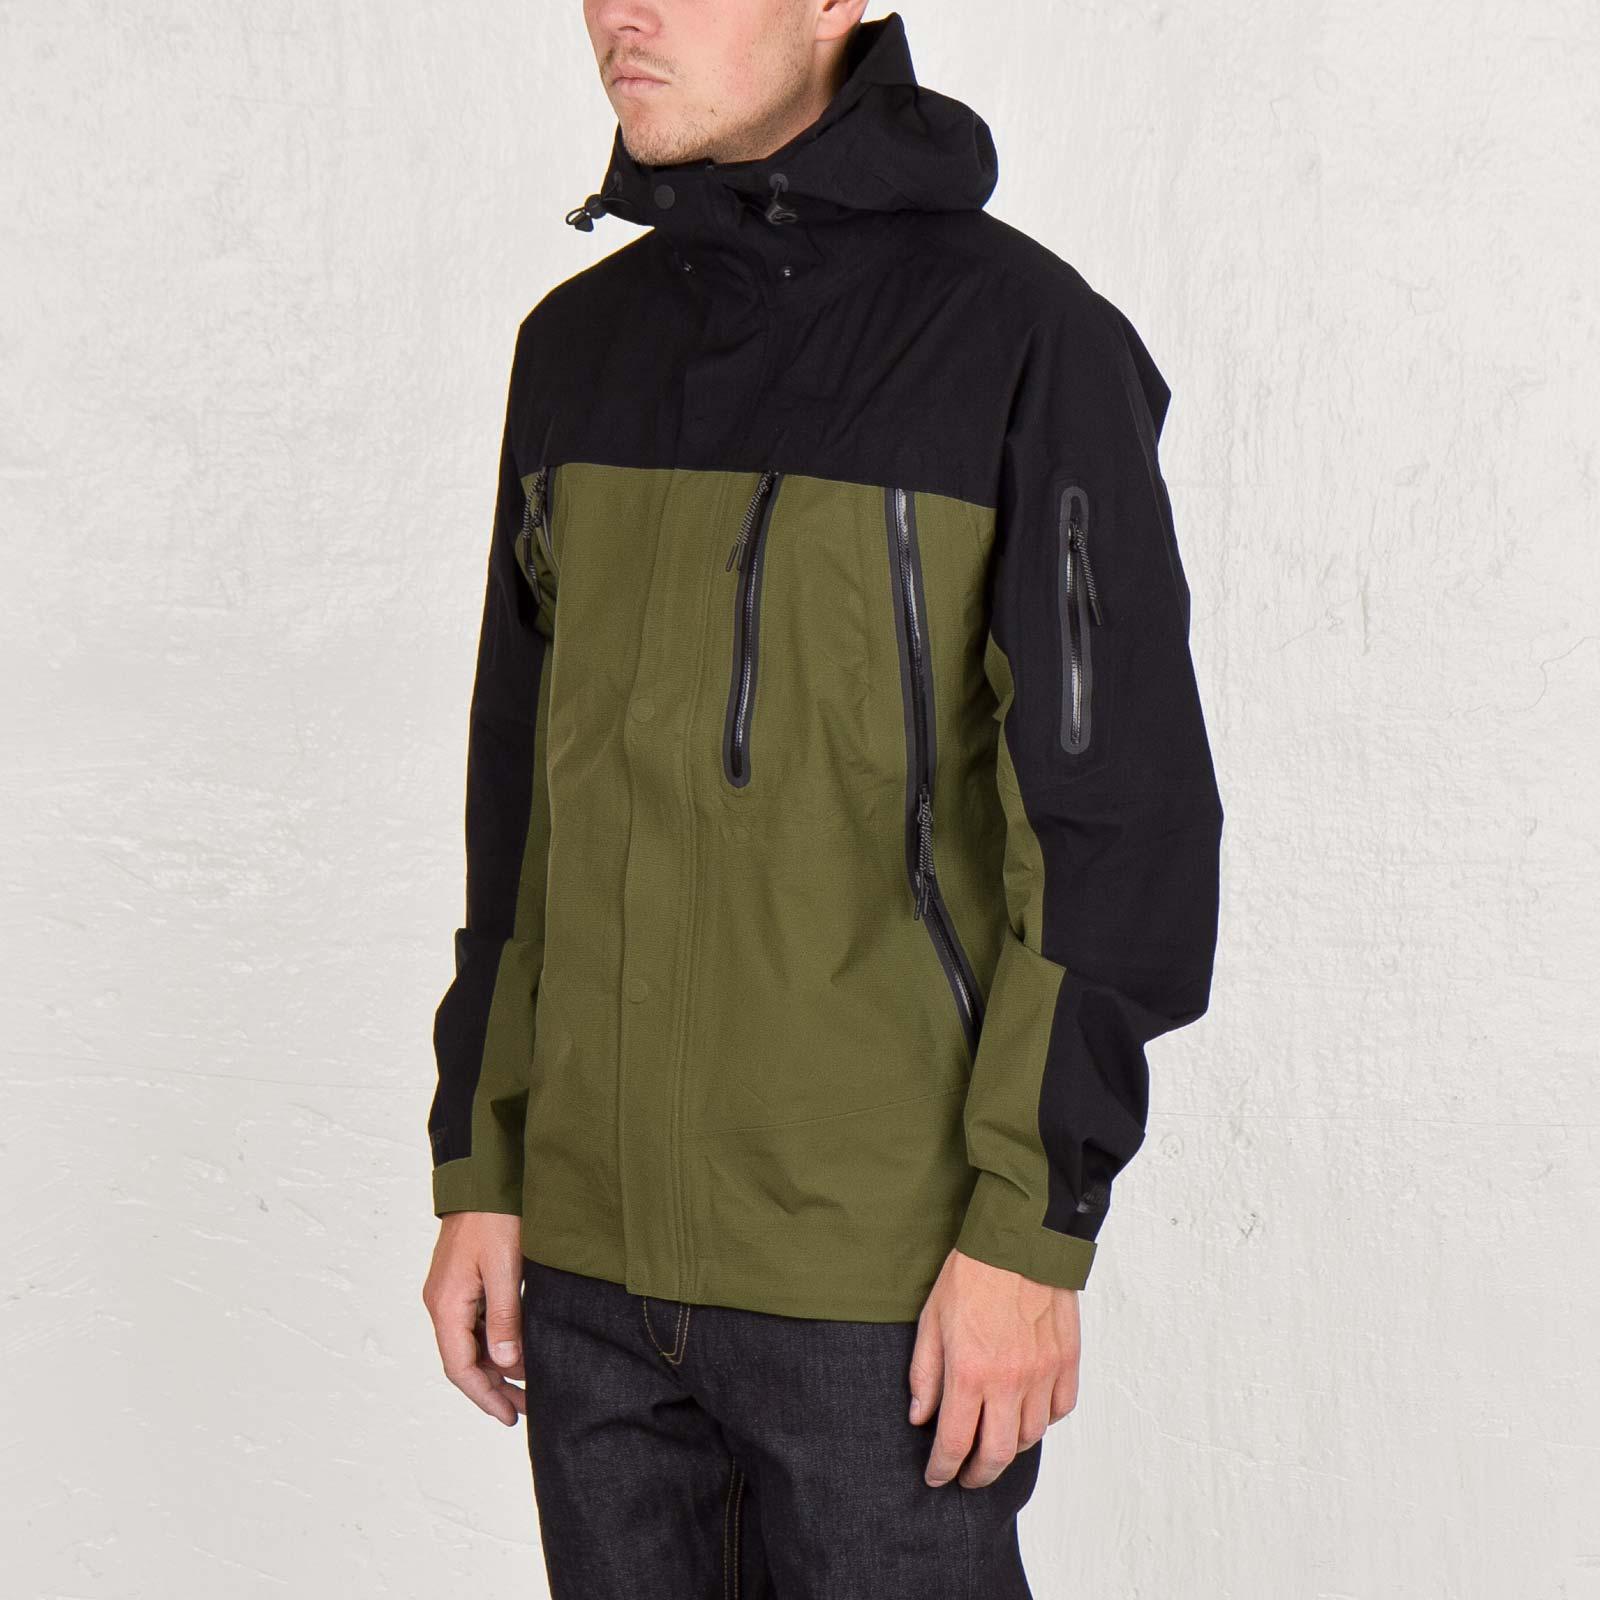 Nike White Label Gore-Tex Jacket - 655303-331 - Sneakersnstuff ...